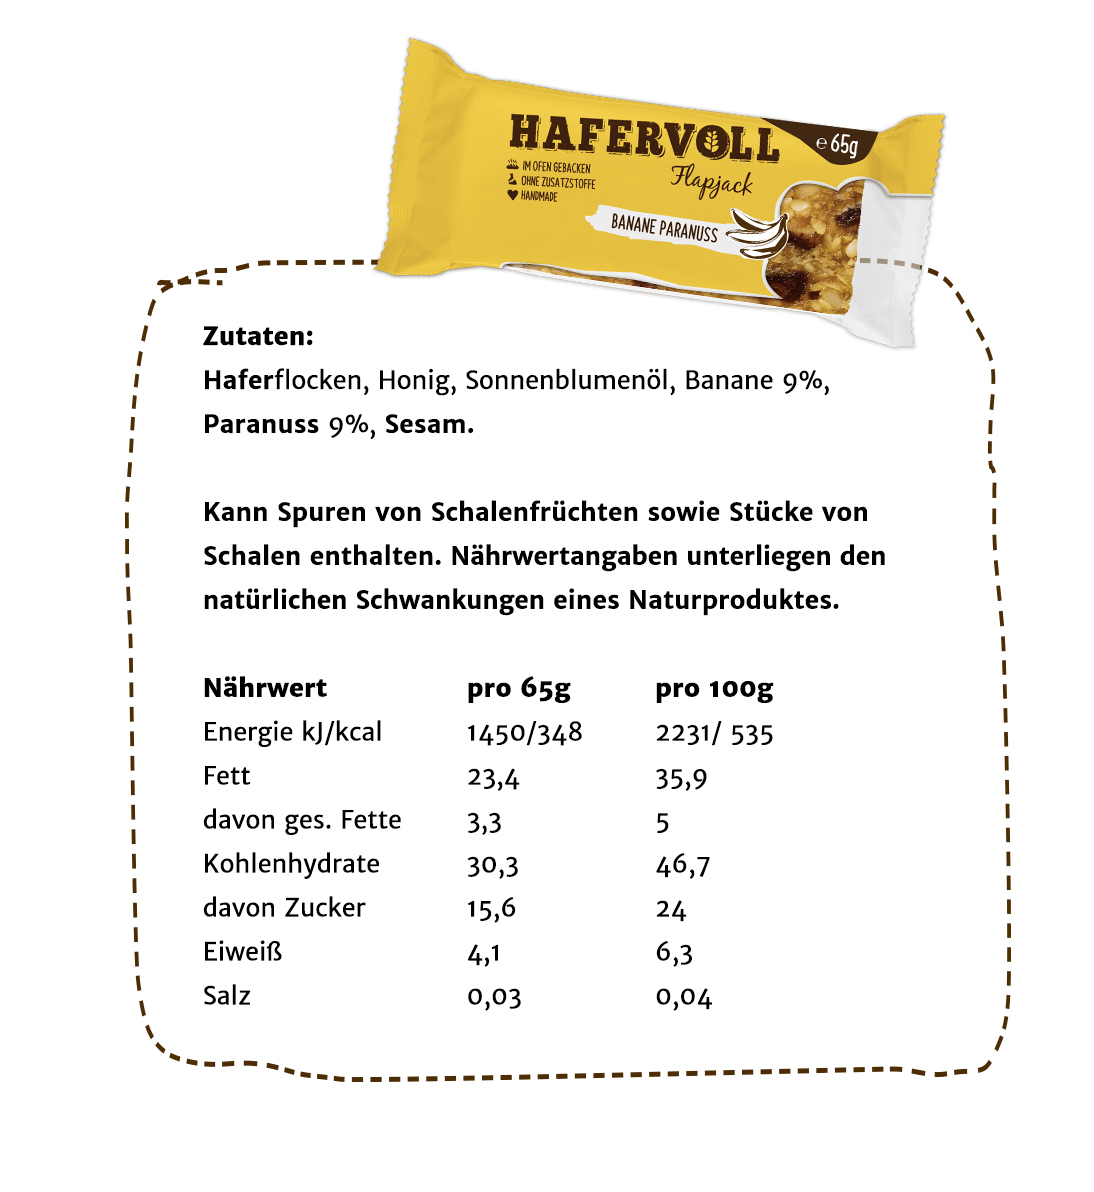 Hafervoll 6er Box Banane Paranuss Flapjack Hafervoll